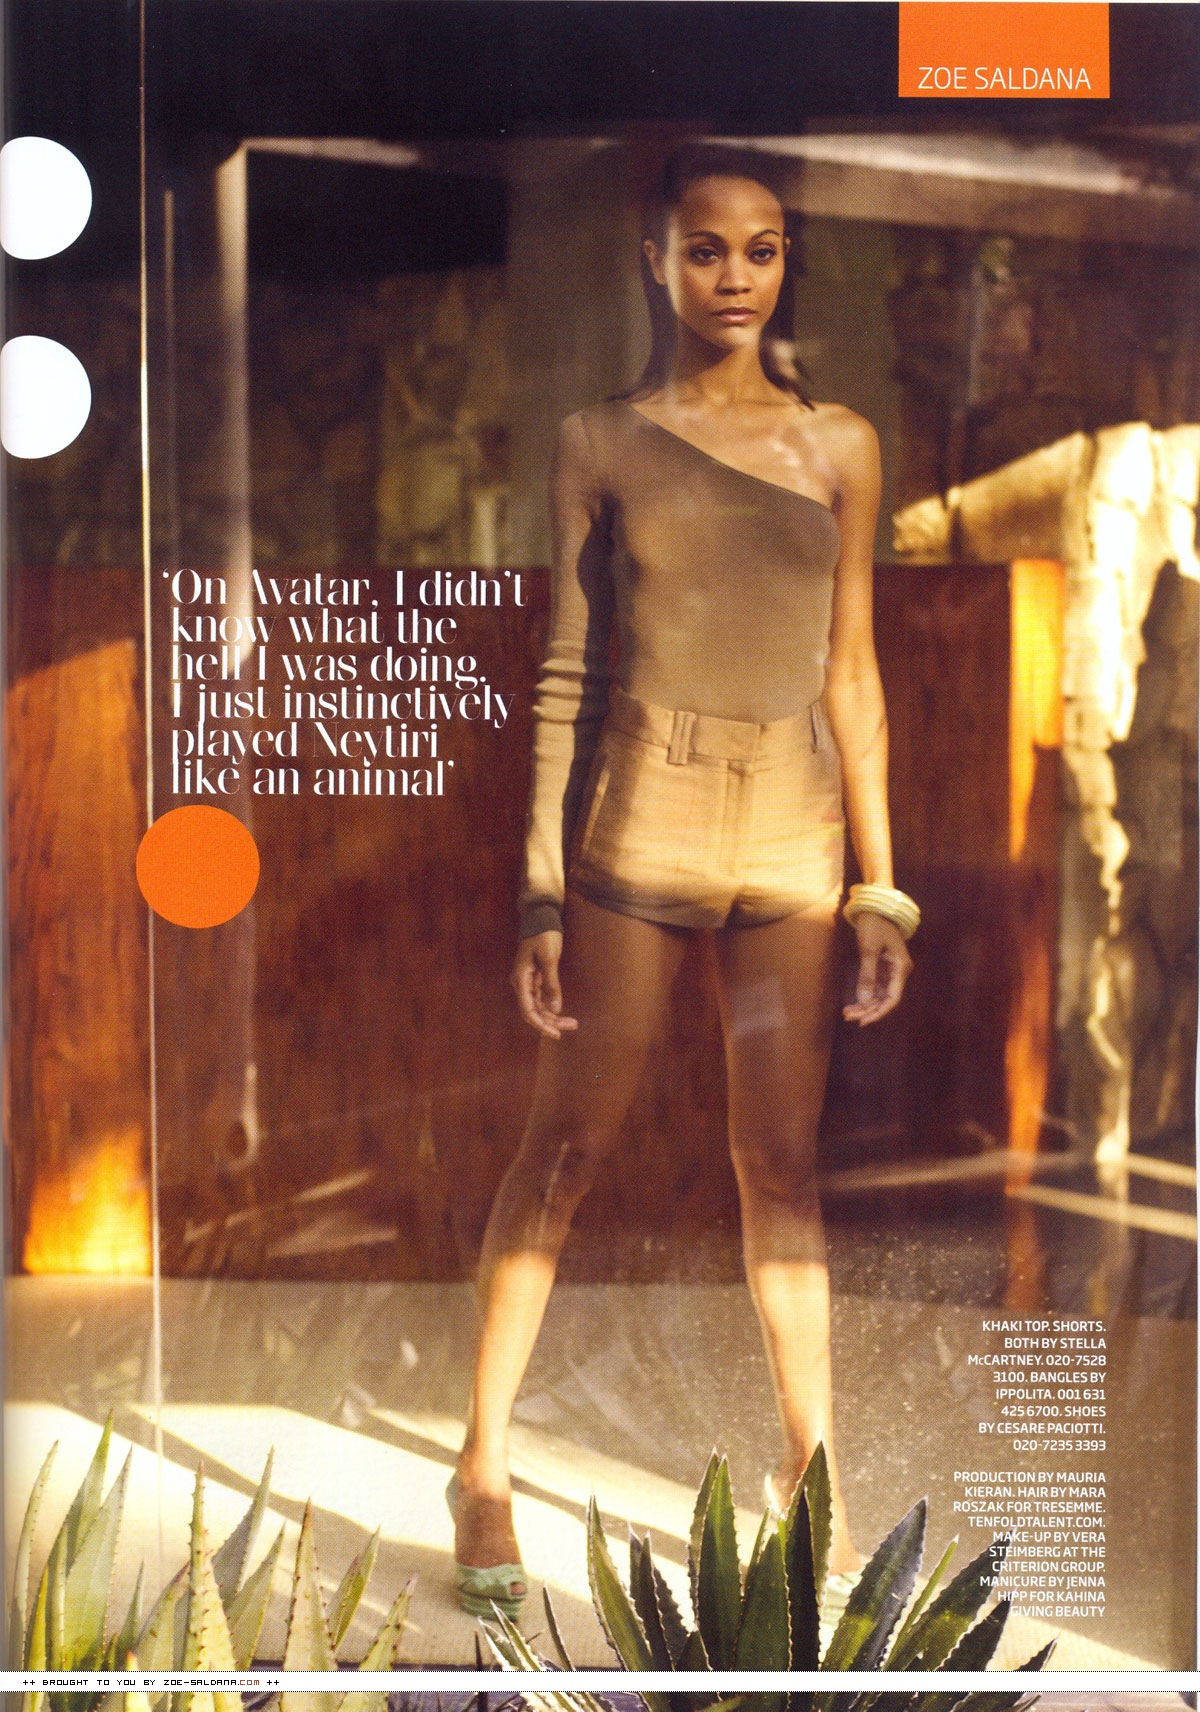 zoe-saldana-in-a-swimsuit-in-gq-magazine-scans-2010-06 ...